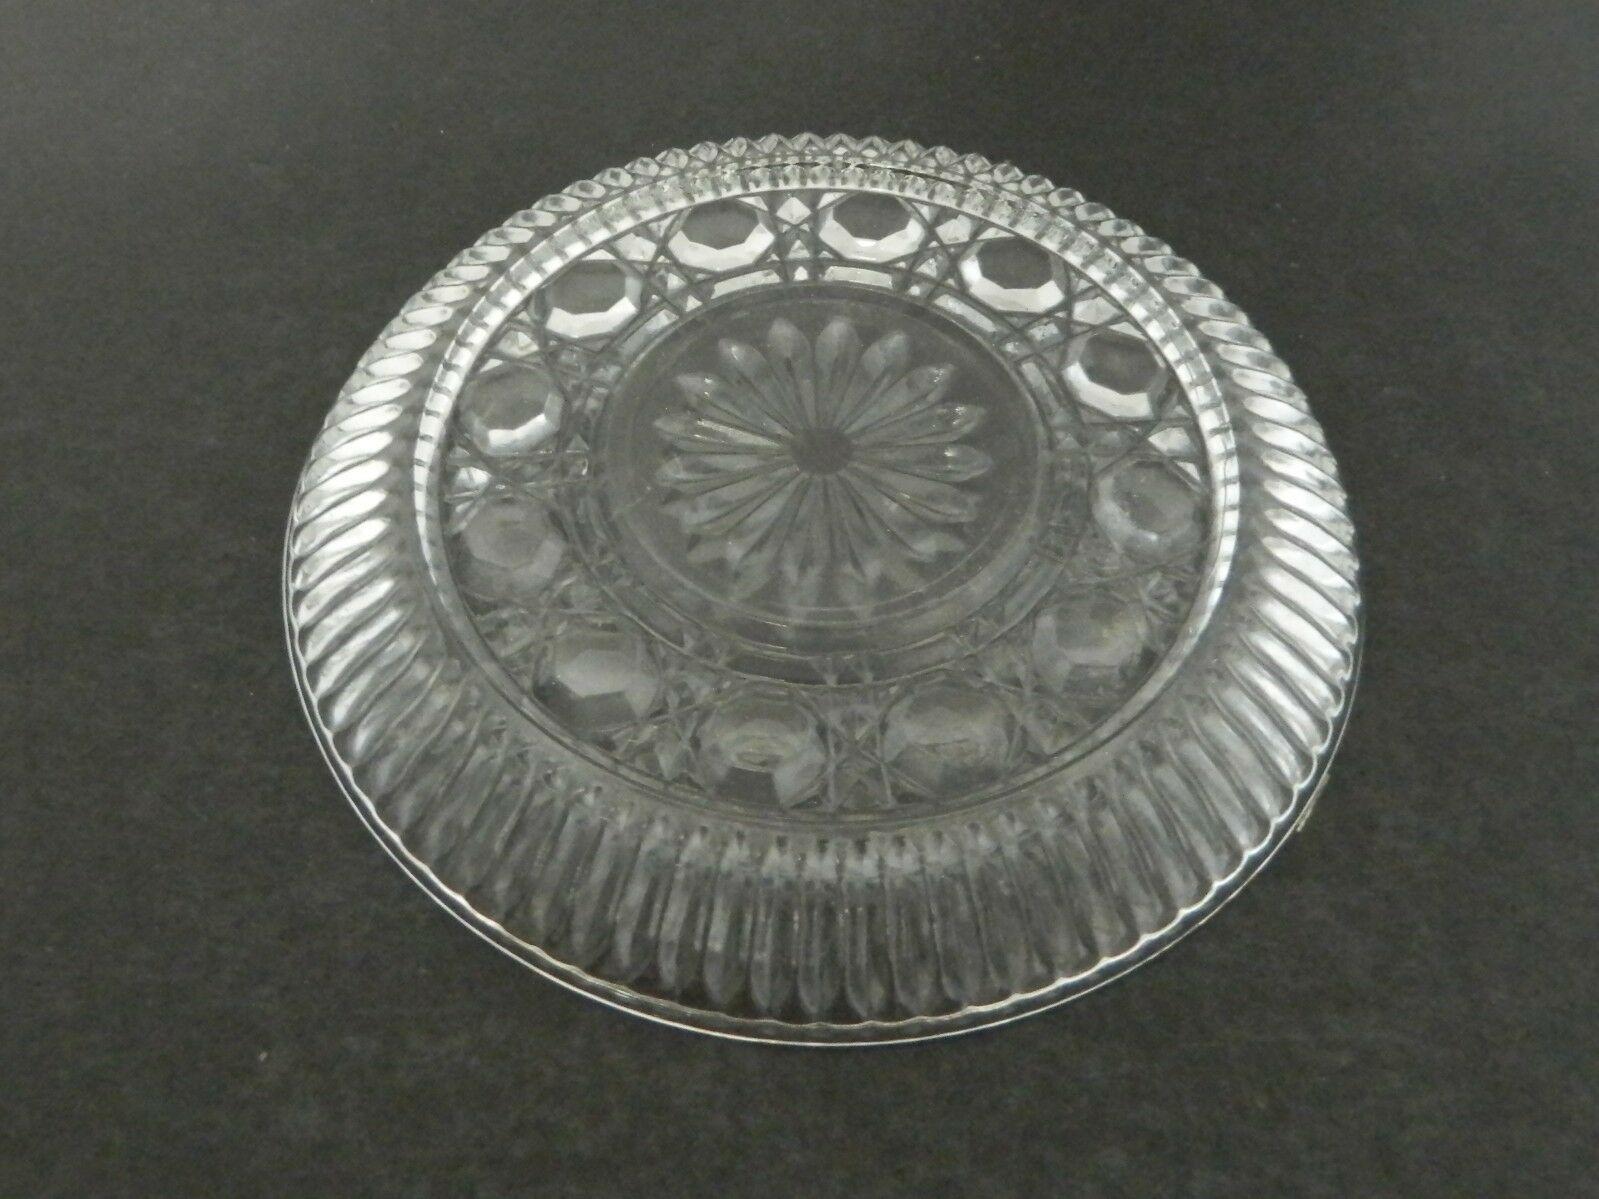 Royal Brighton Windsor Indiana Glass Bread / Dessert Plate  6 1/2 inch